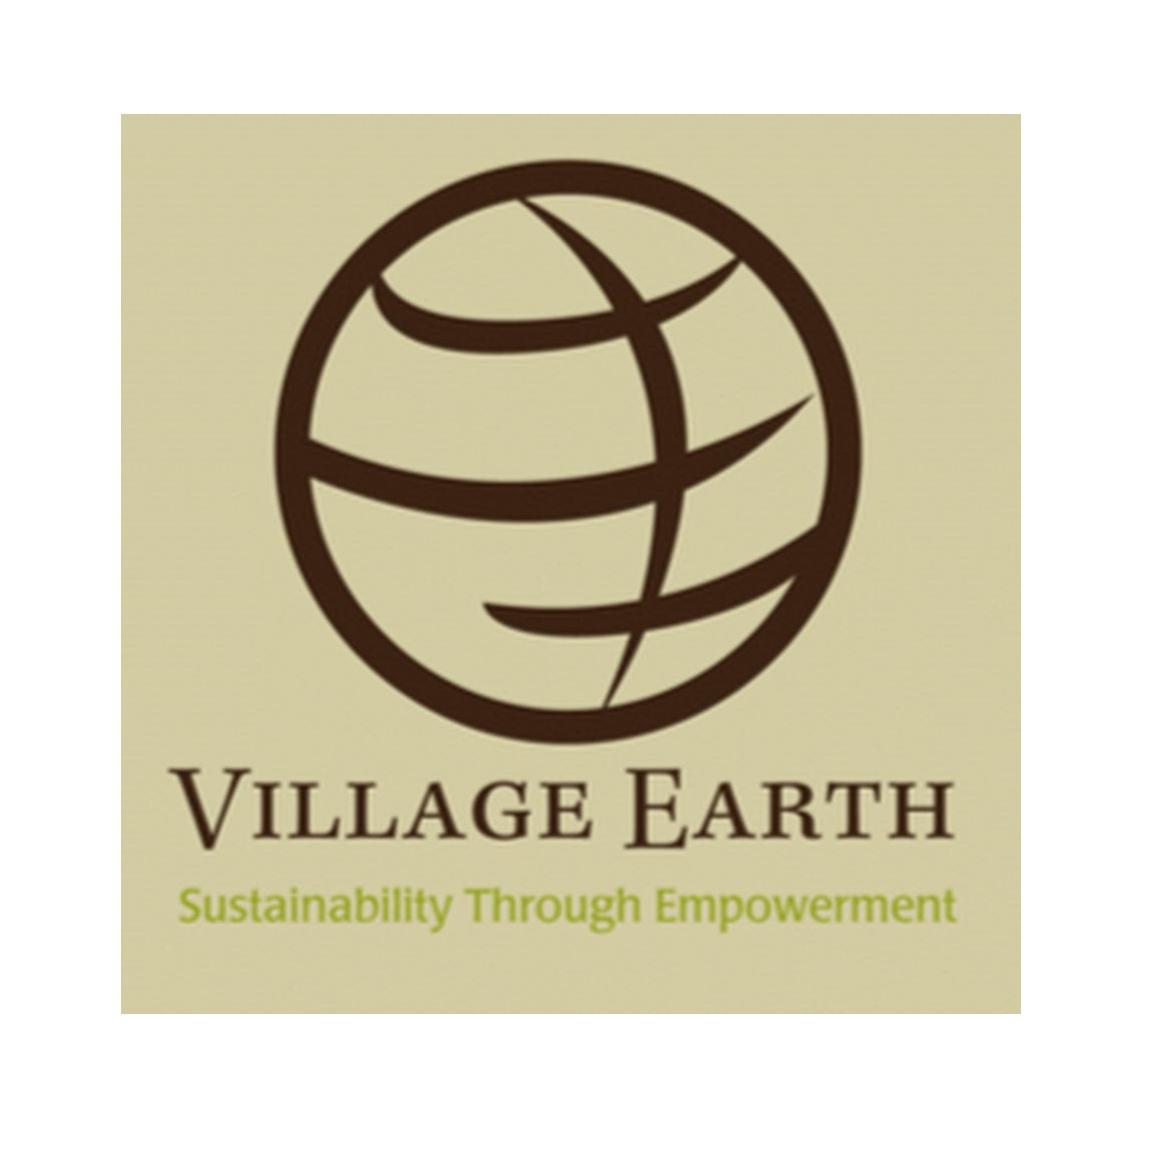 Pilot Project_Partner logo_Village Earth_whitespace.png